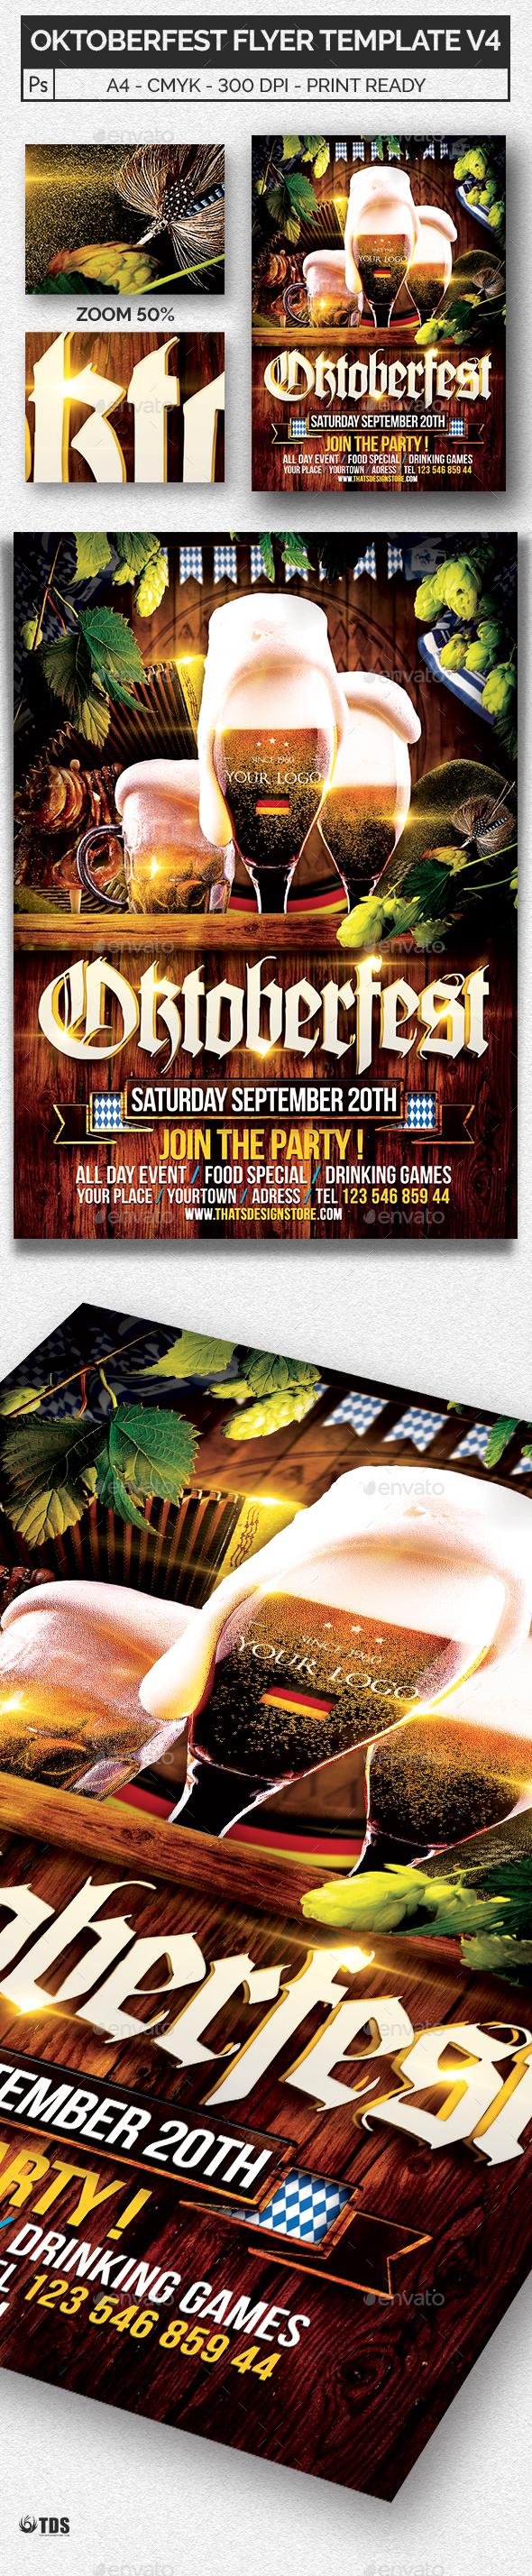 Oktoberfest Flyer Template V4 - Holidays Events